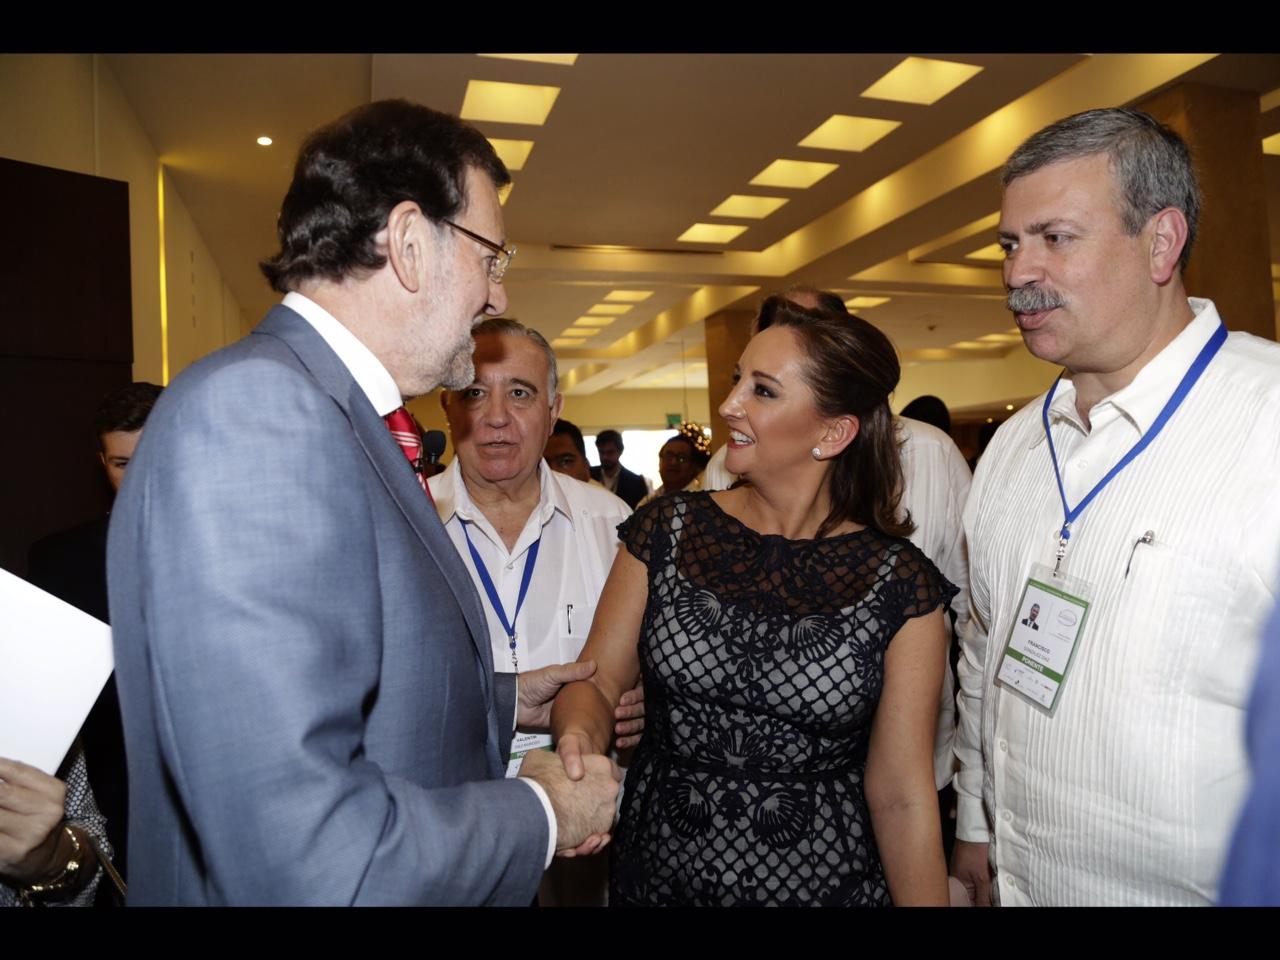 encuentro empresarial iberoamericano claudia ruiz massieujpg